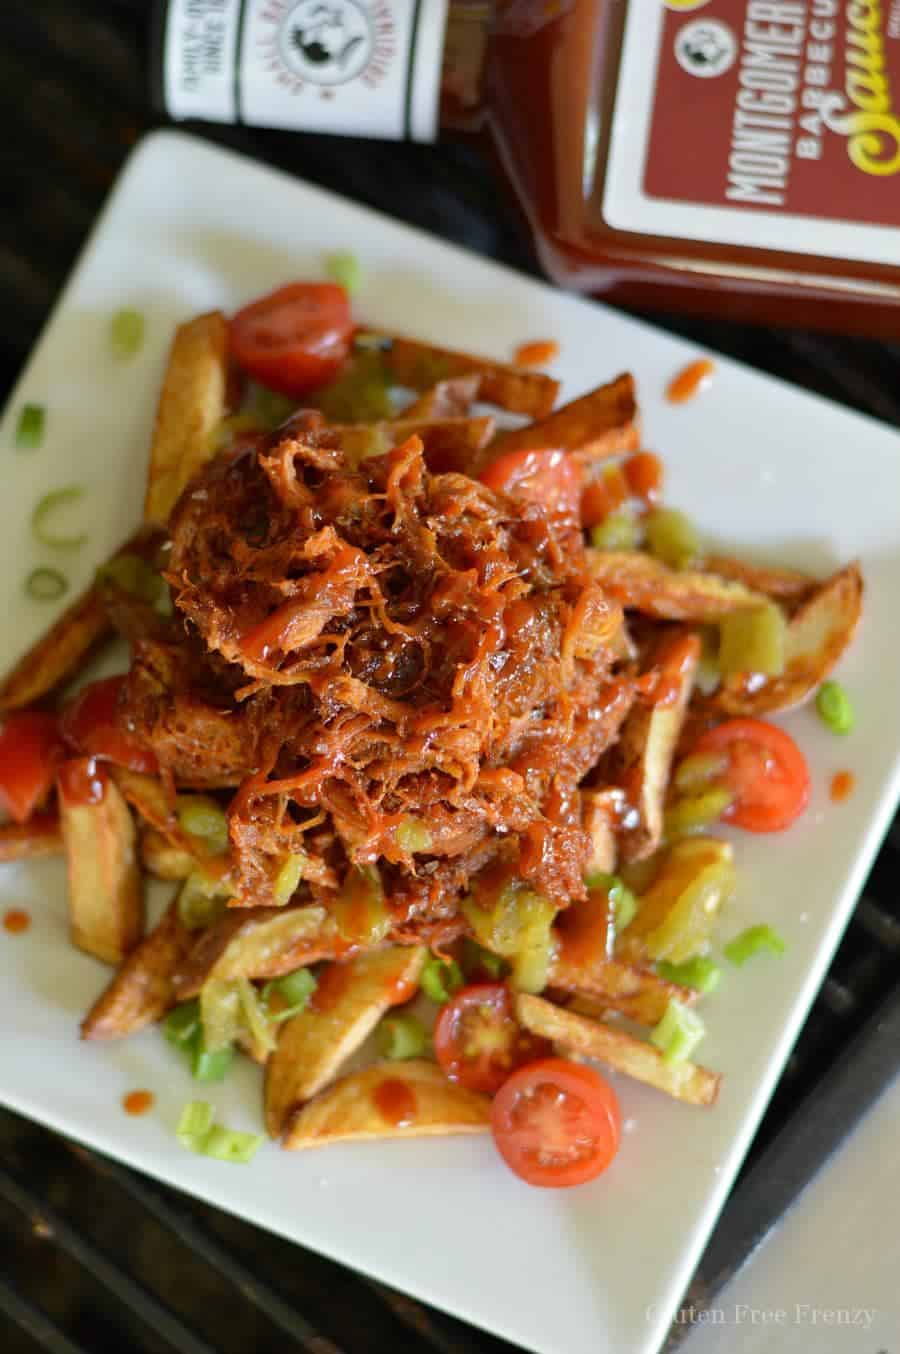 Montgomery Inn BBQ Sauce, Shredded Pork & Ribs PLUS Giveaway